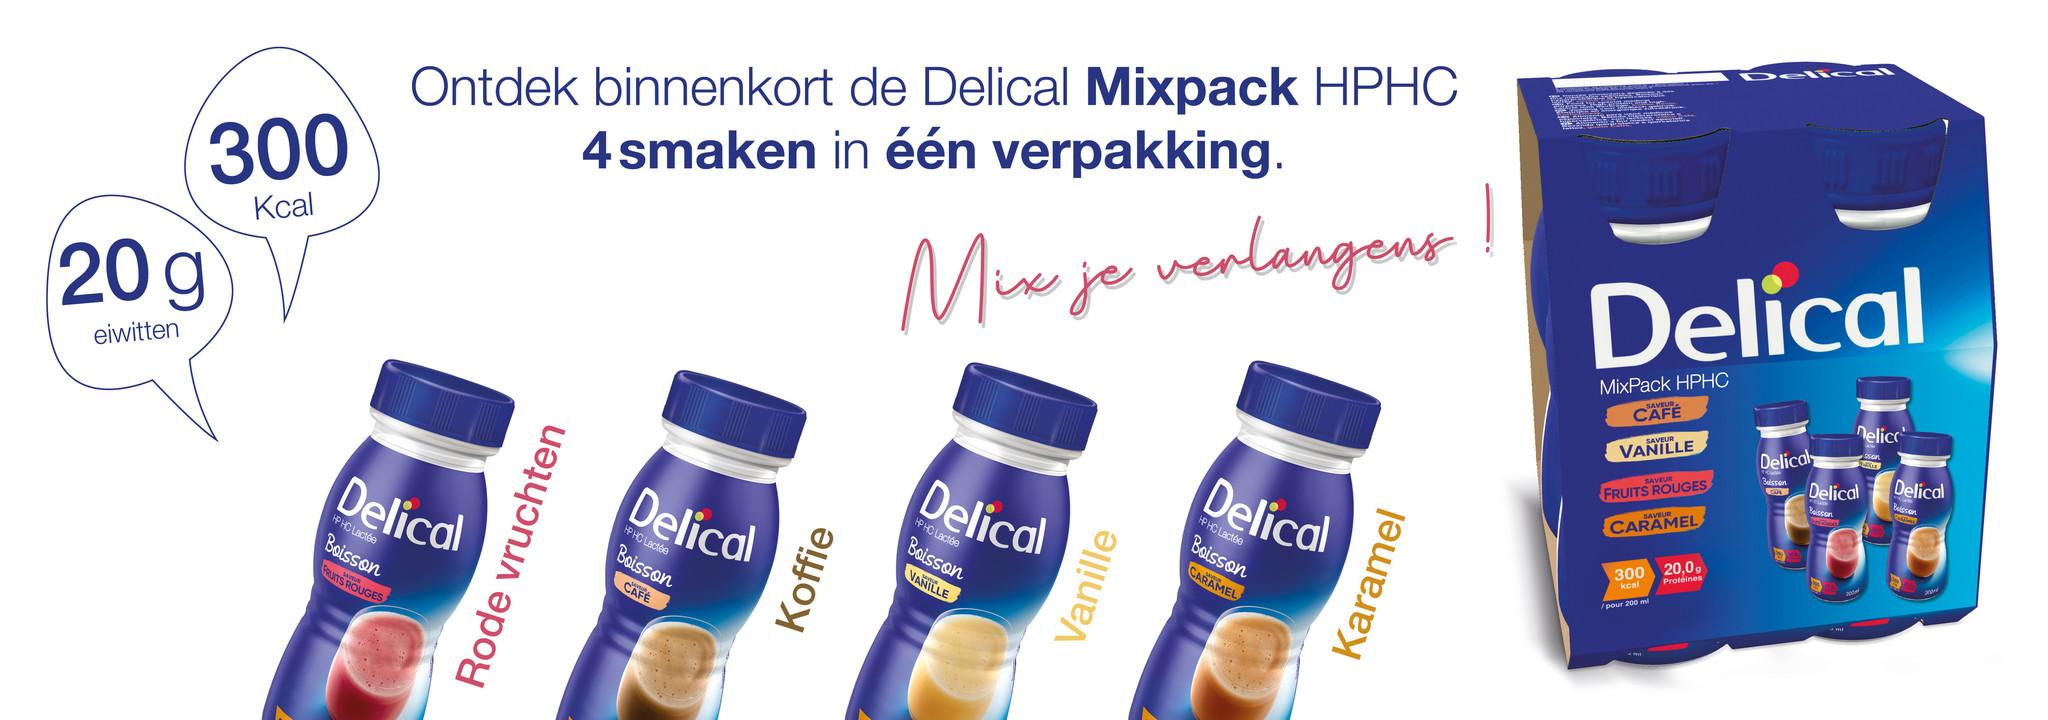 Delical Delical HP HC drank - assortiment 4 smaken